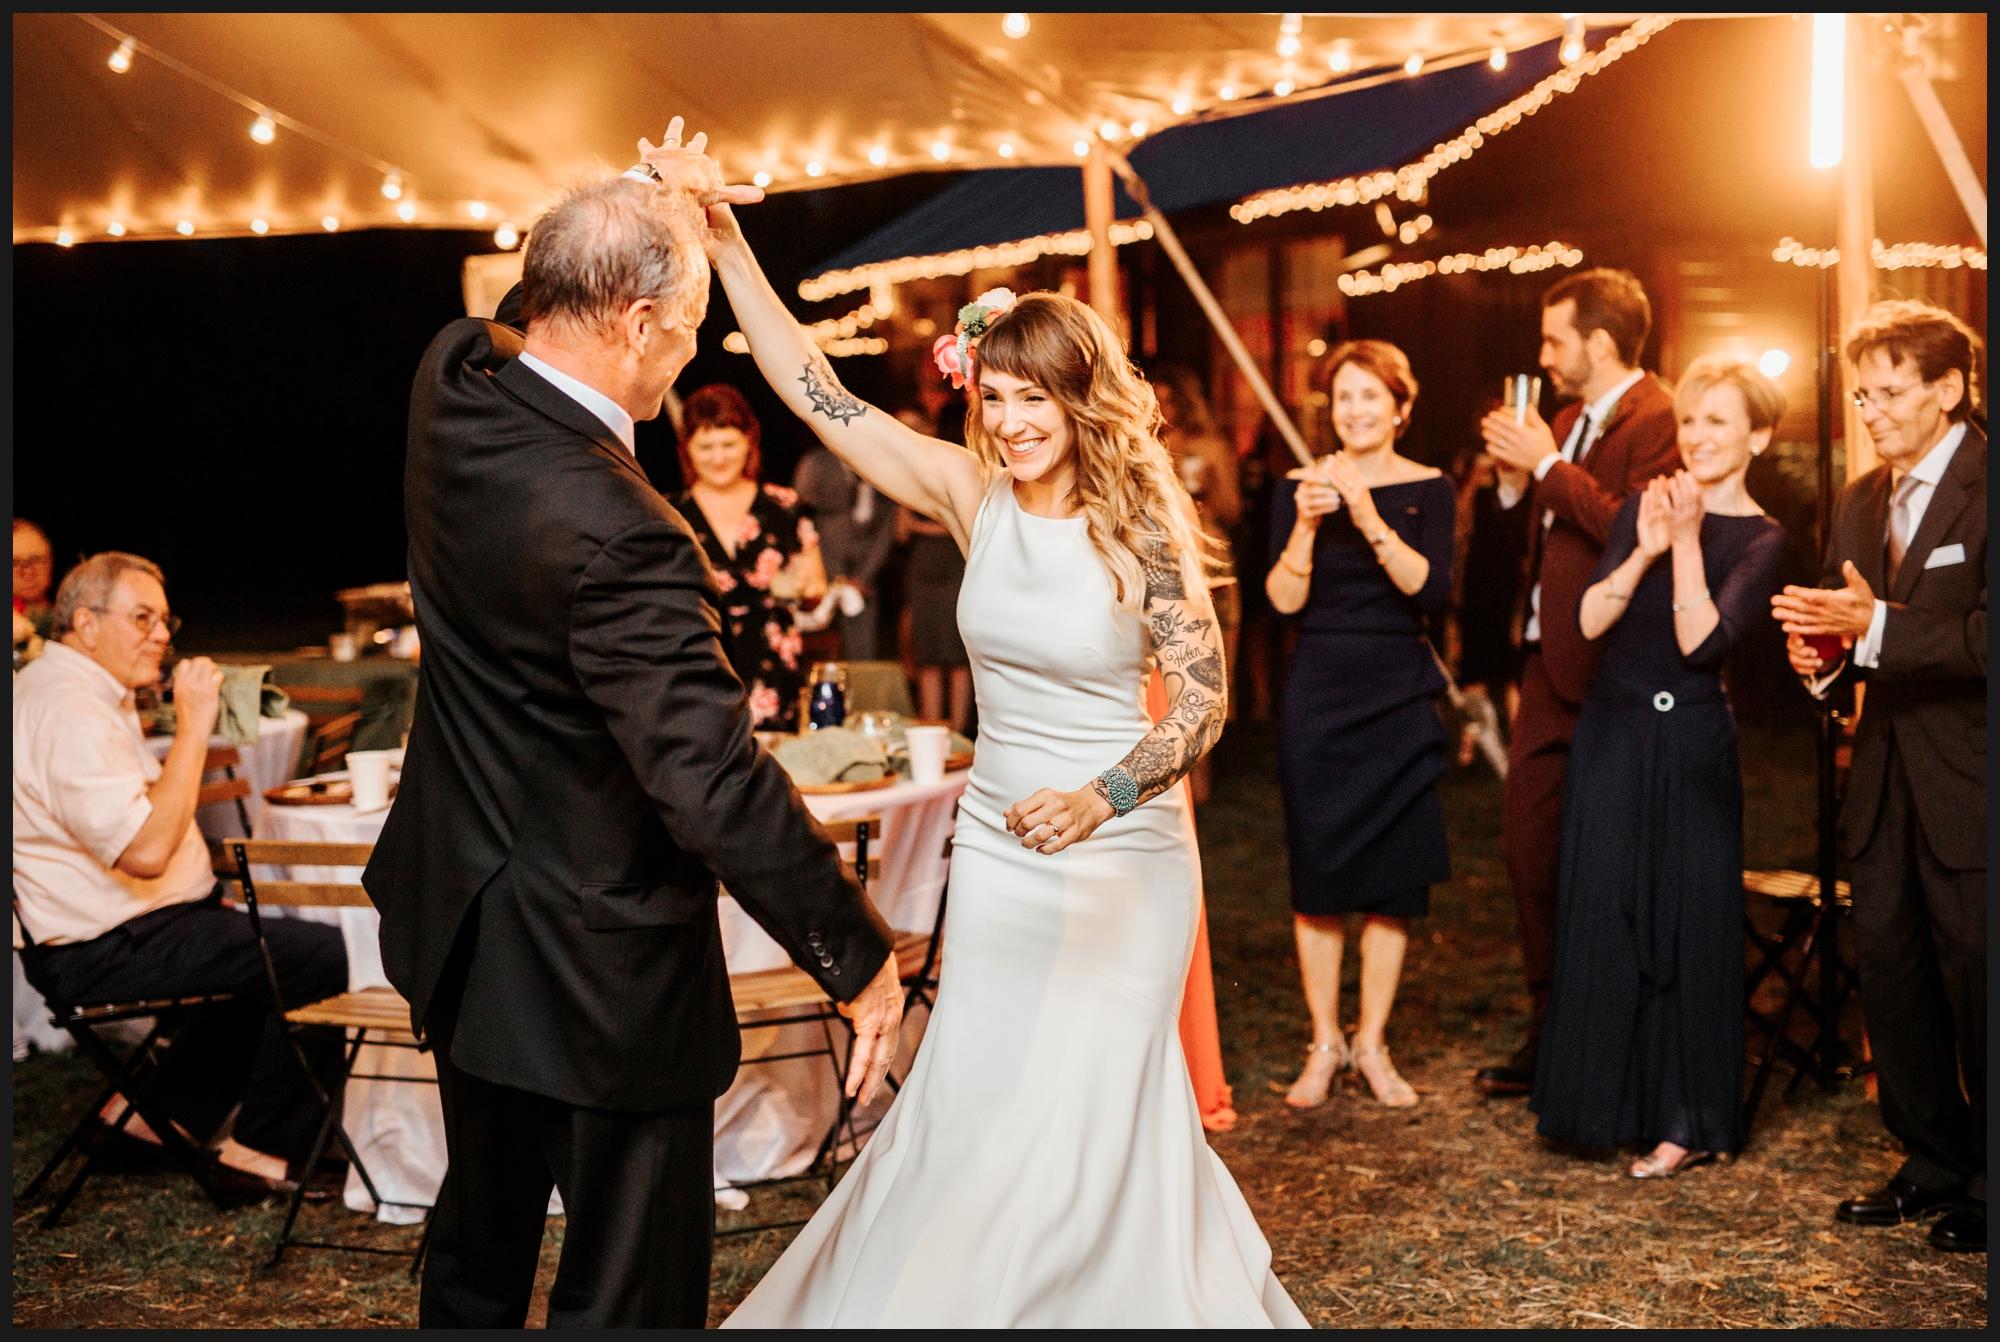 Orlando-Wedding-Photographer-destination-wedding-photographer-florida-wedding-photographer-bohemian-wedding-photographer_2046.jpg